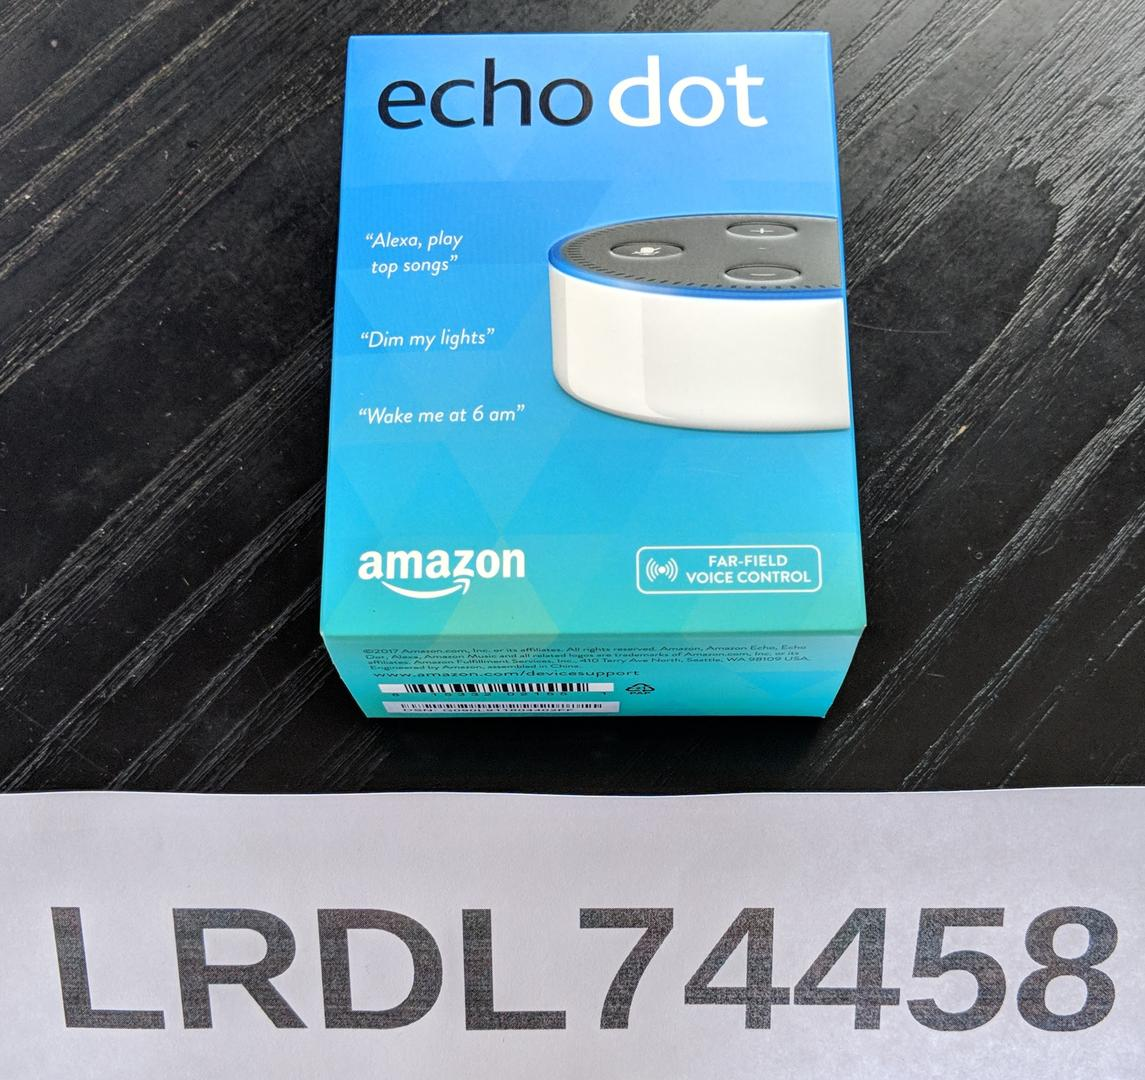 buy amazon echo dot 2nd gen white lrdl74458 swappa